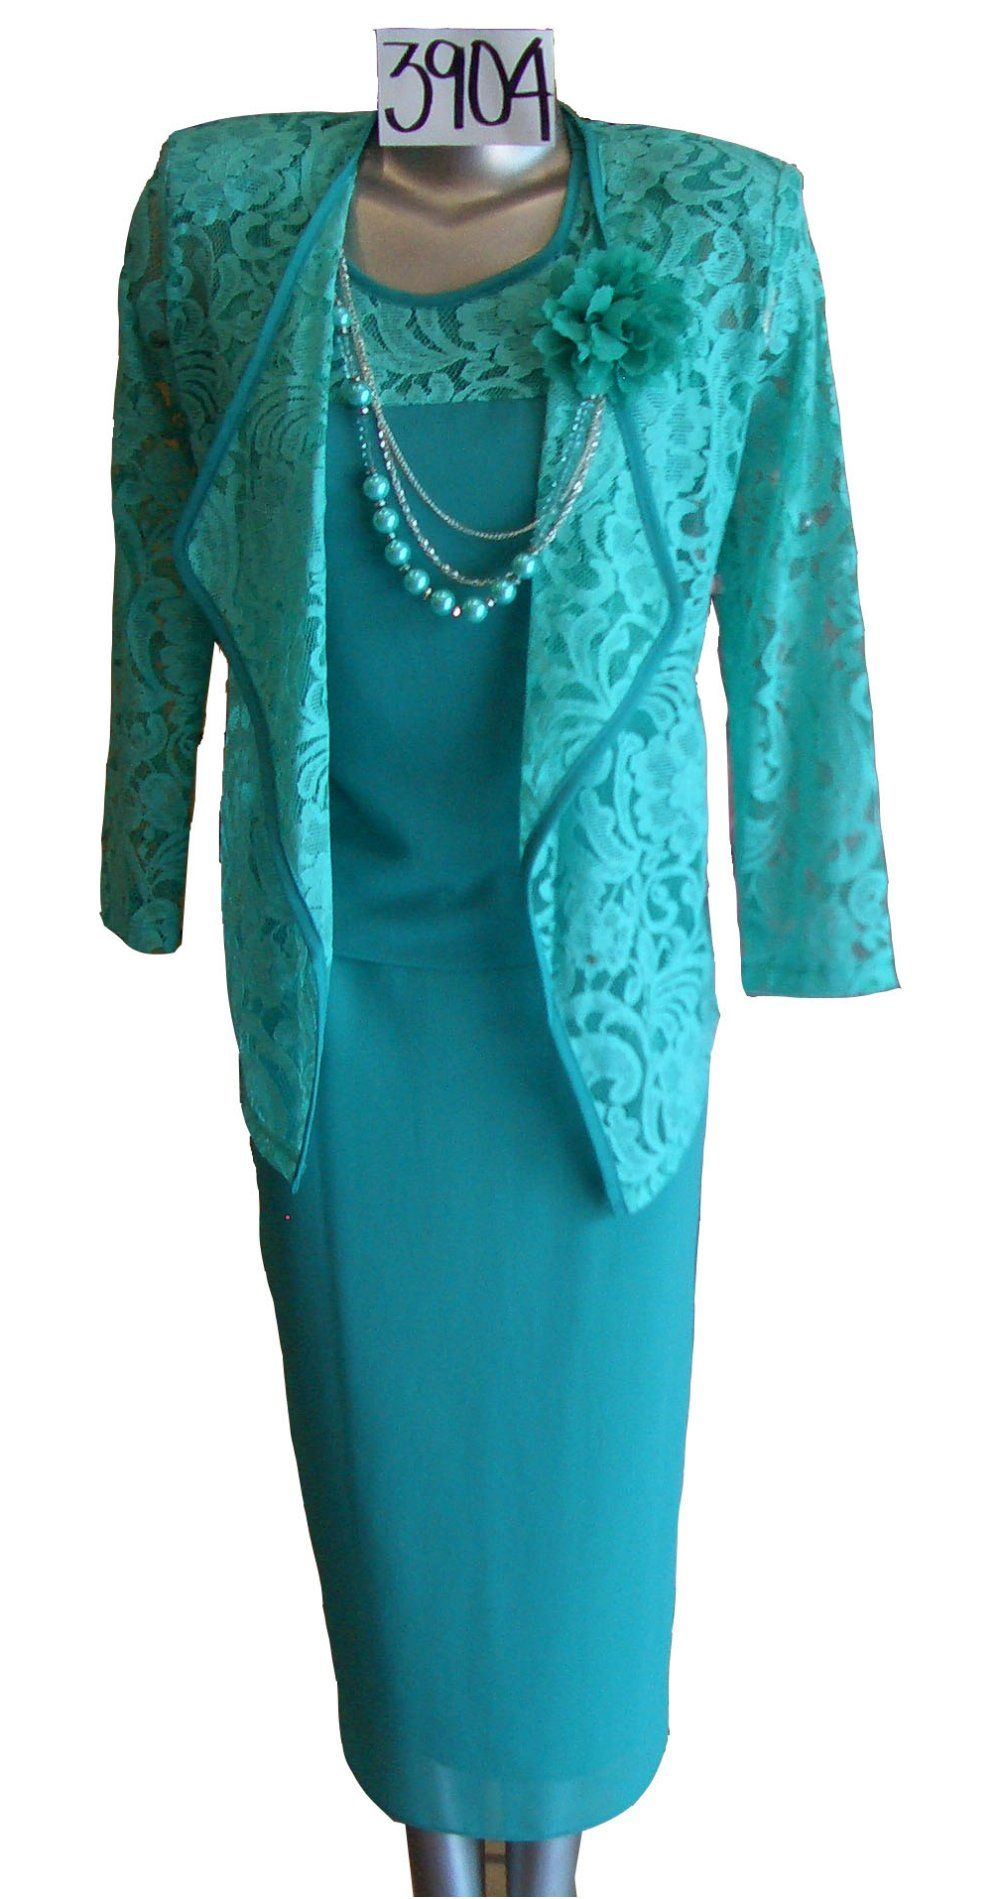 3 Piece Set Dress Jade Green Semi Formal Tea Length With Jacket ...